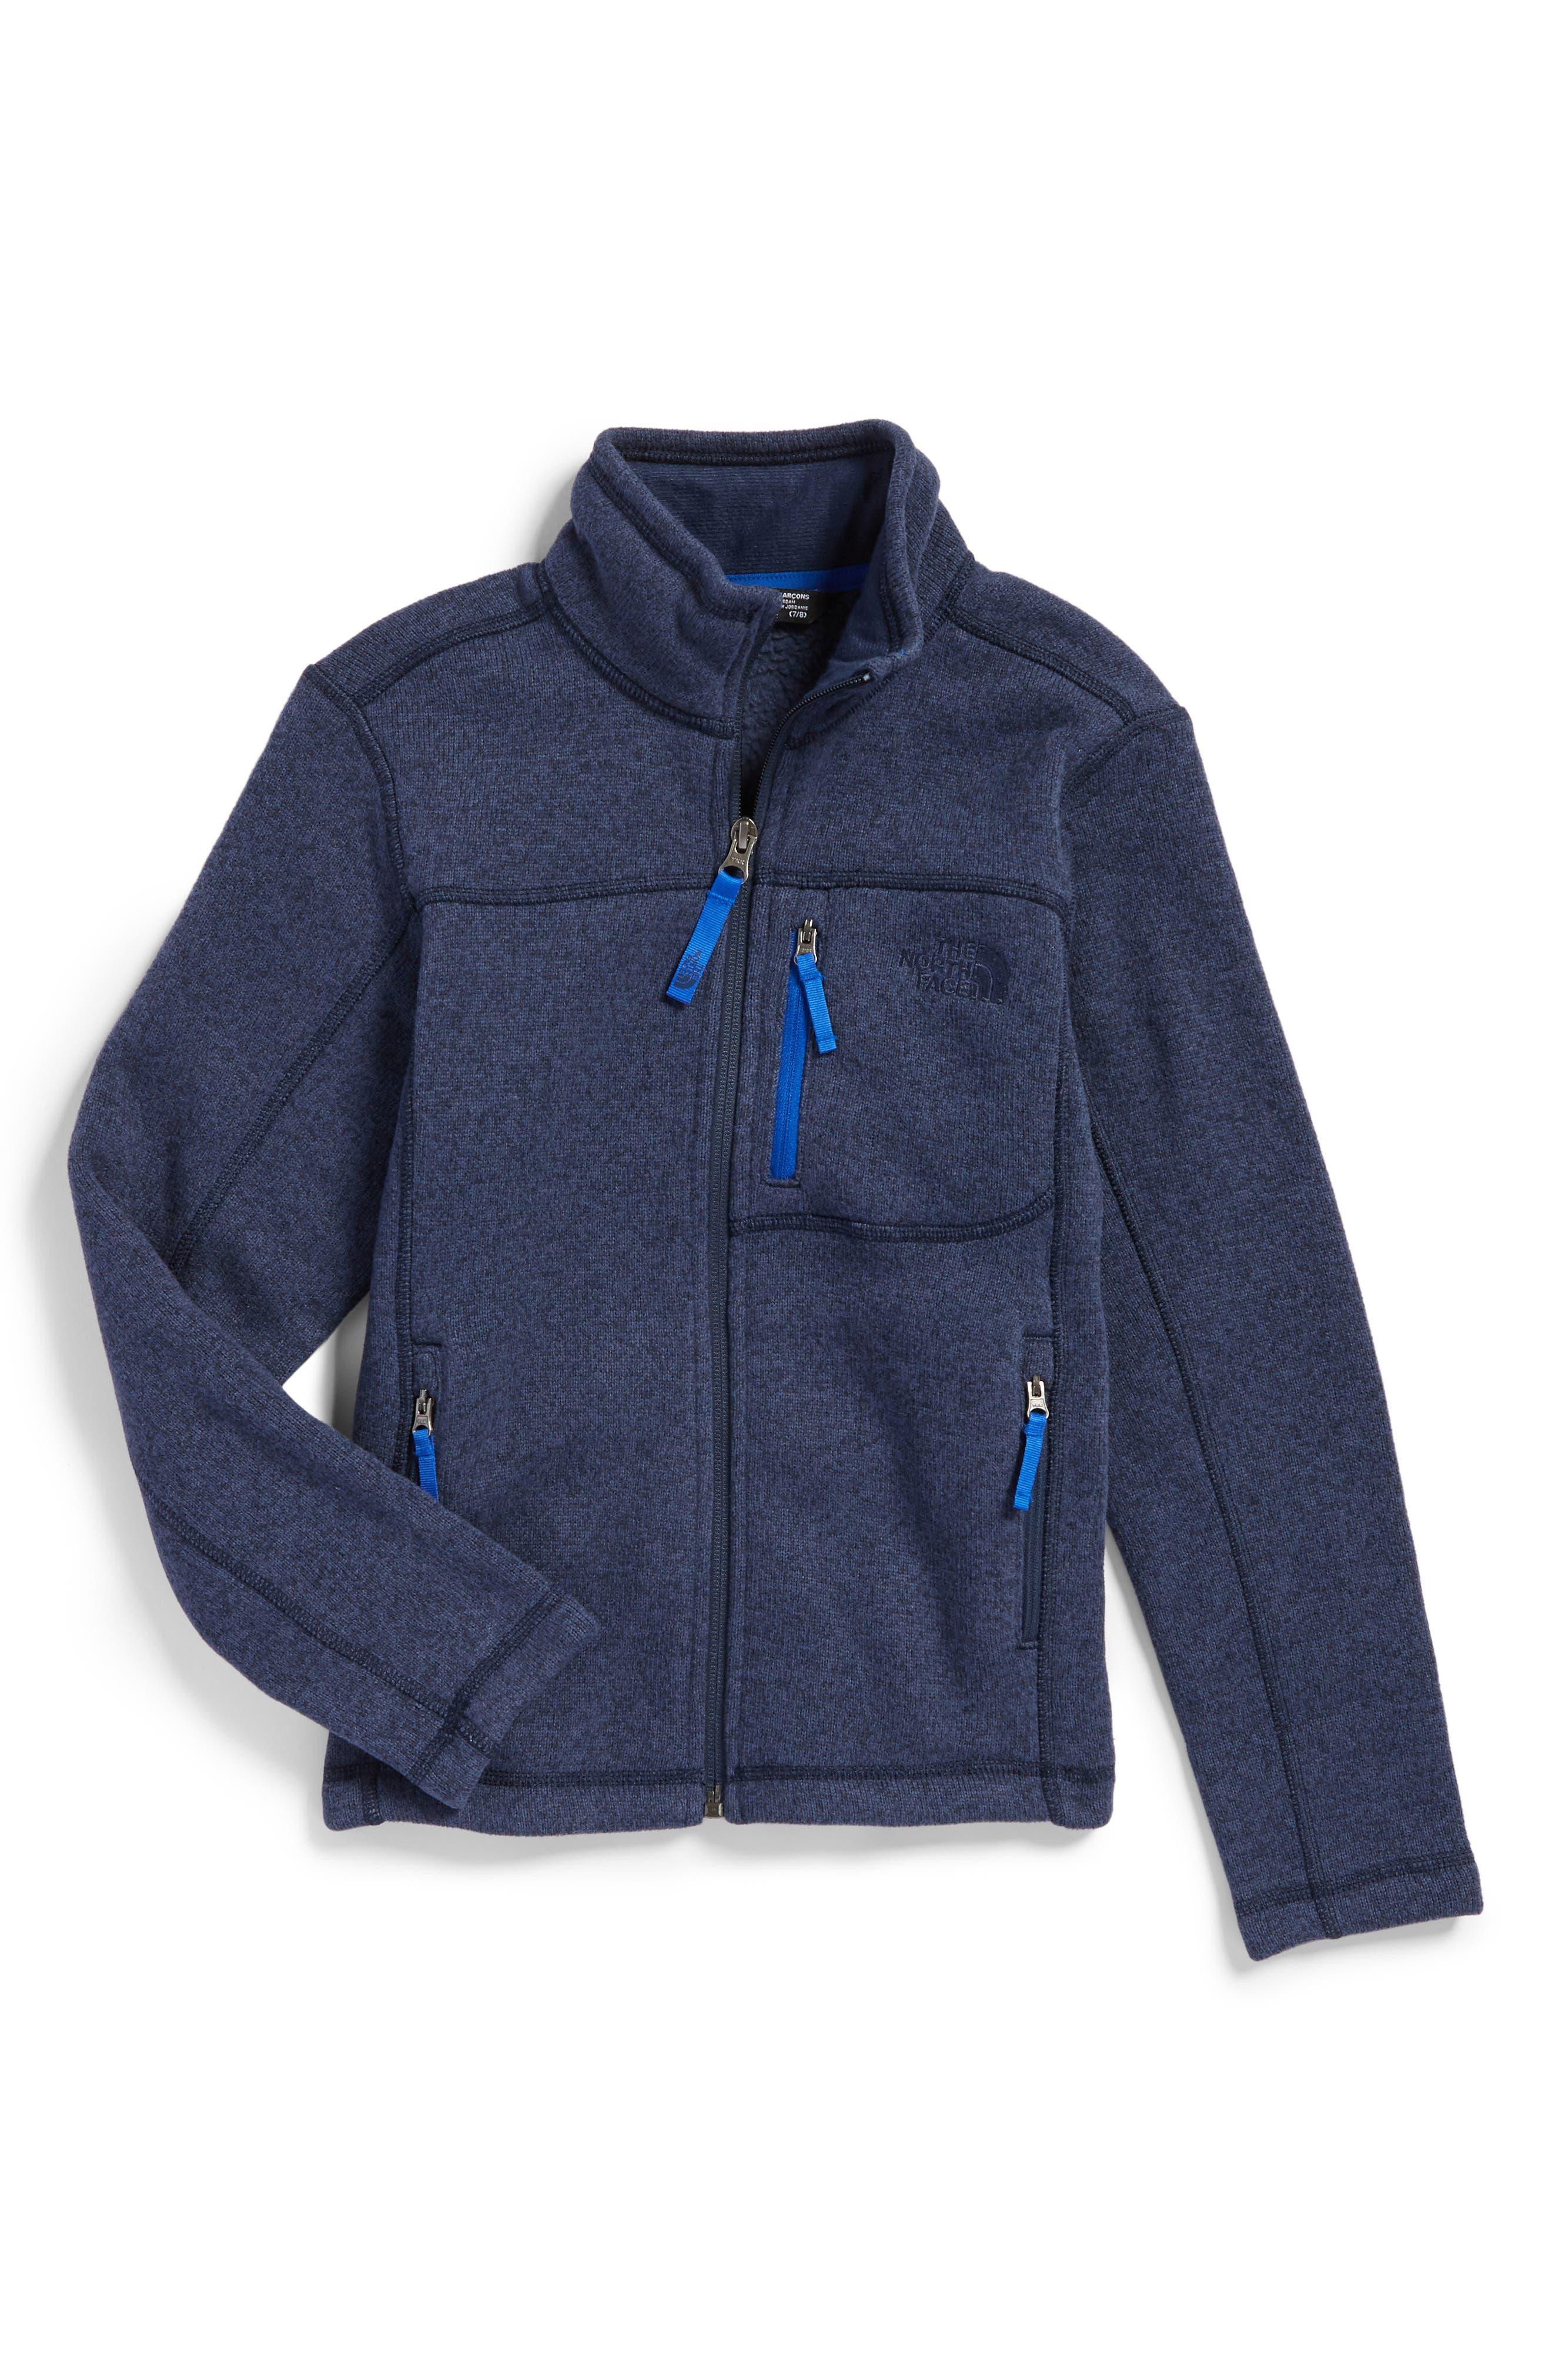 Gordon Lyons Sweater Fleece Zip Jacket,                         Main,                         color, Cosmic Blue Heather